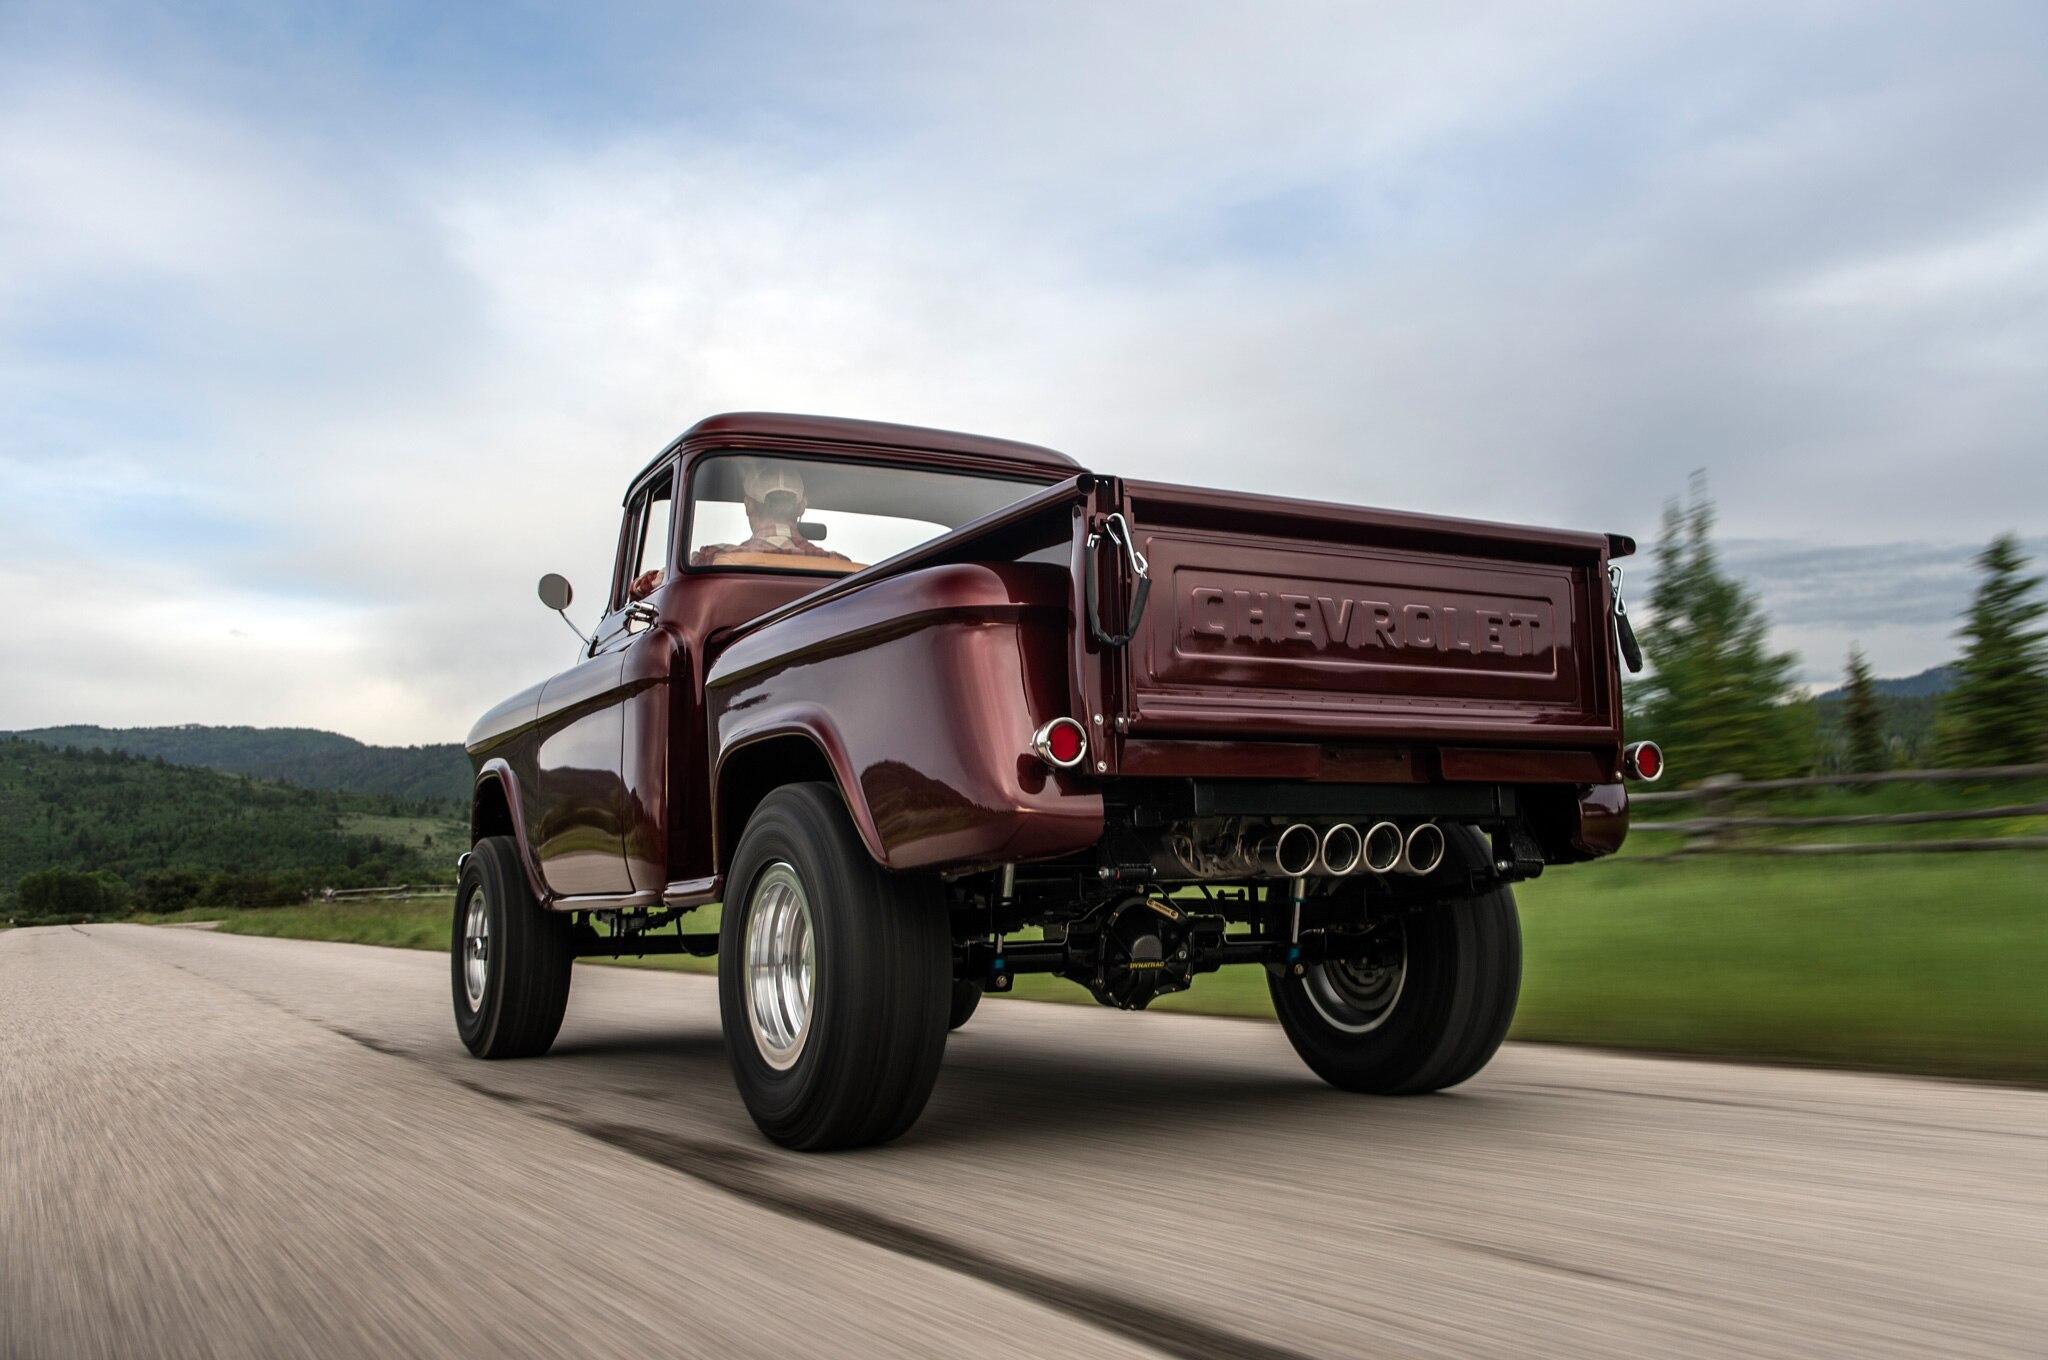 1957 chevrolet task force napco legacy classic trucks rear three quarter low in motion